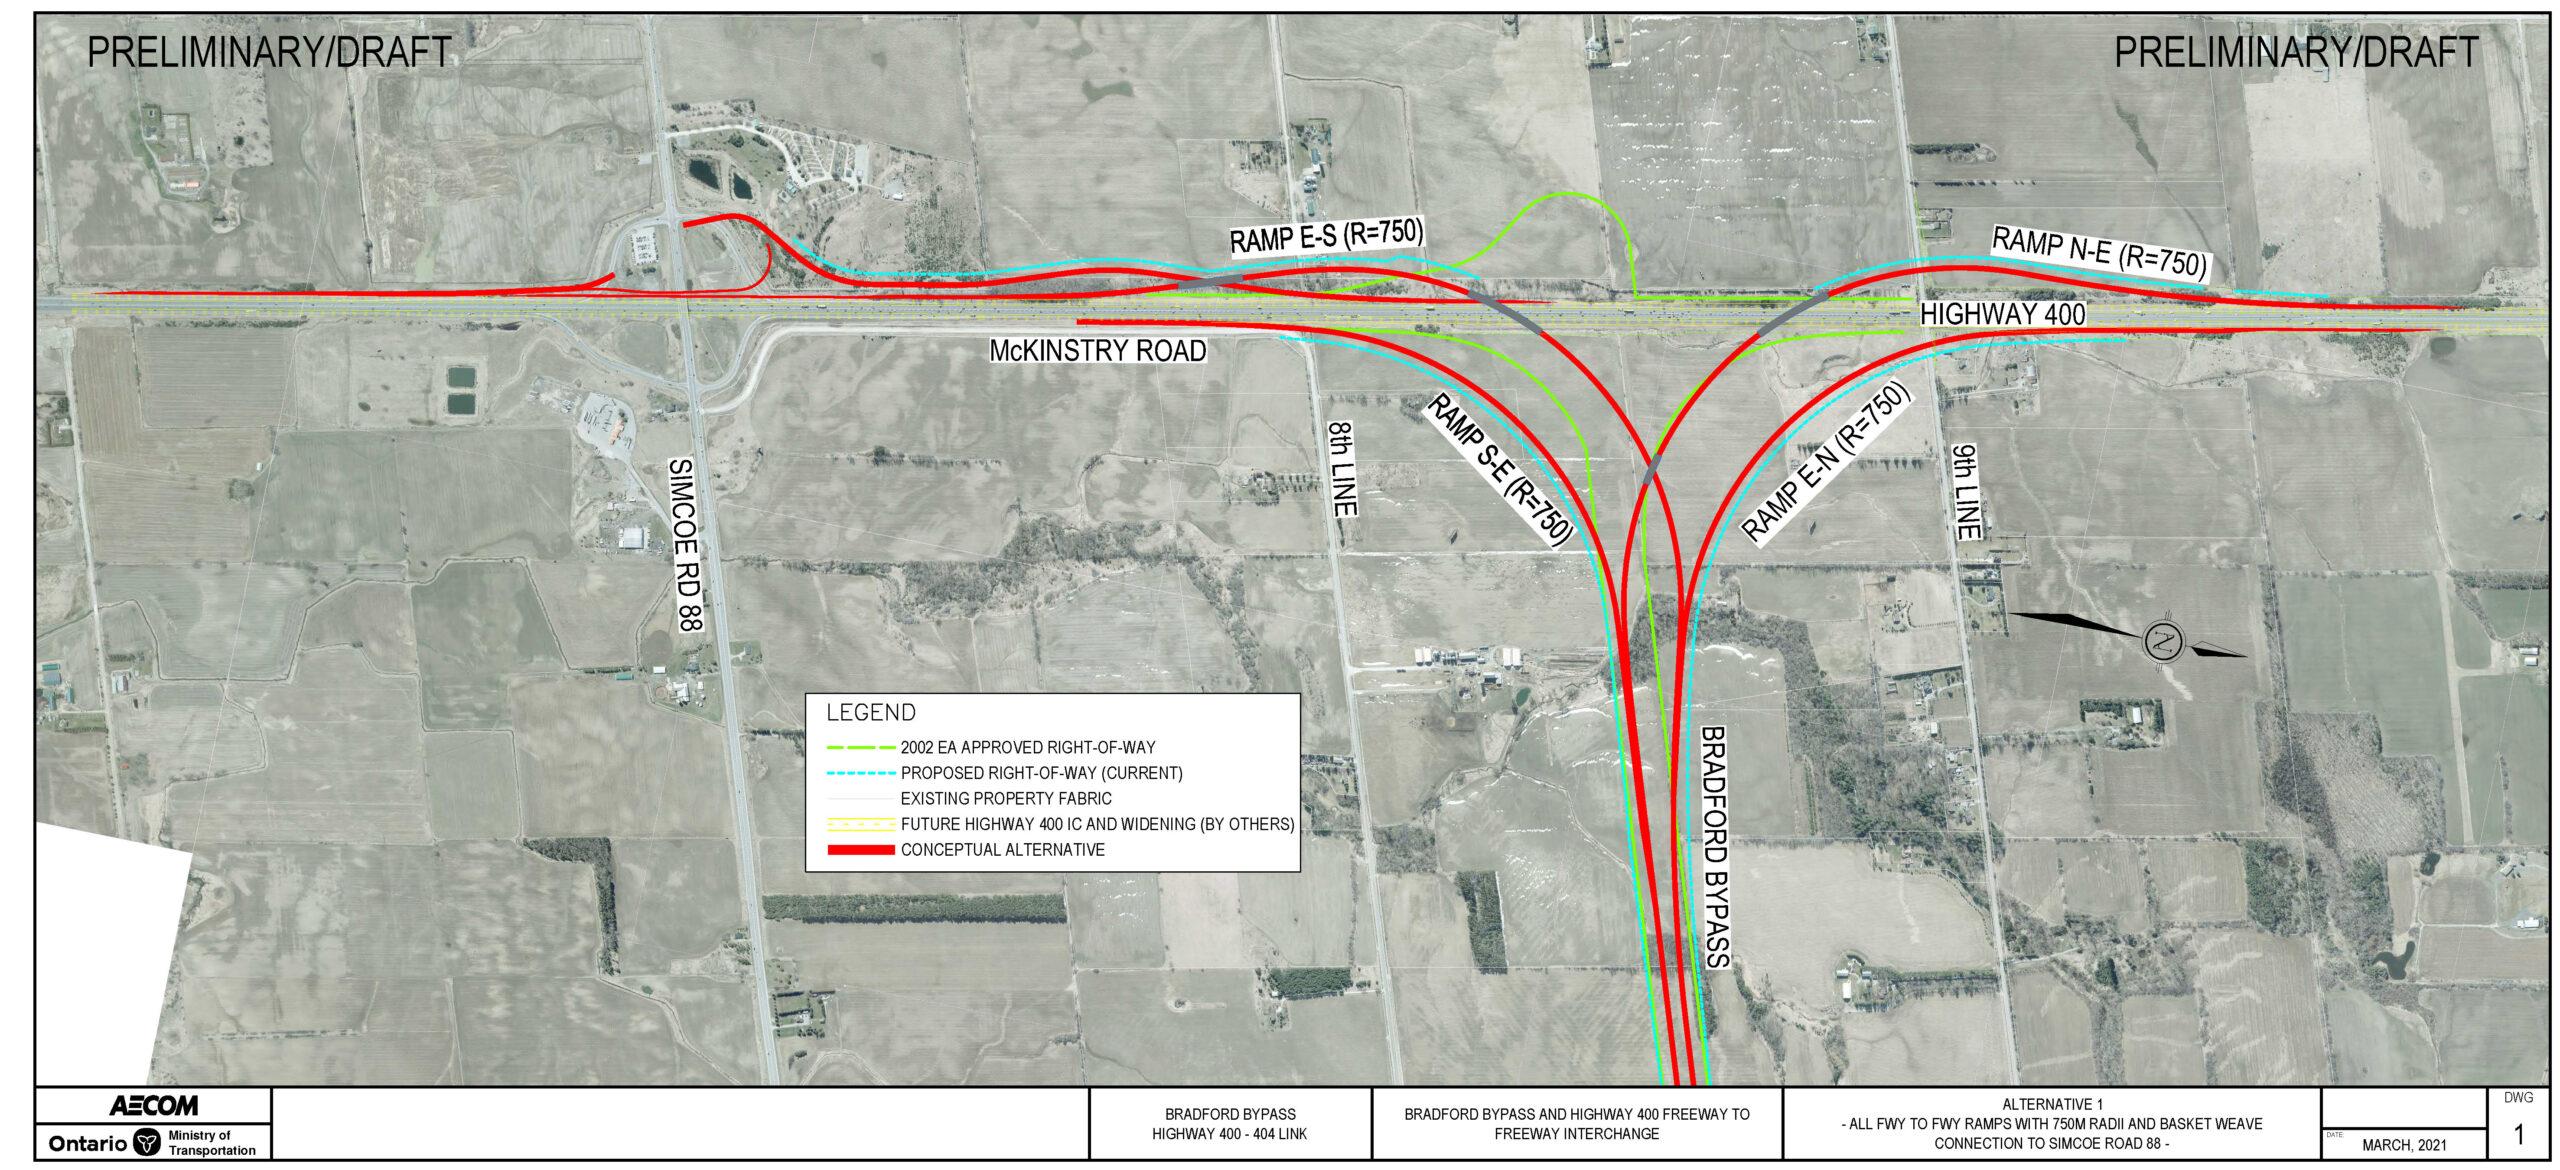 Highway 400 Interchange Refinement Alternative 1 with basketweave 750 metre ramp radii